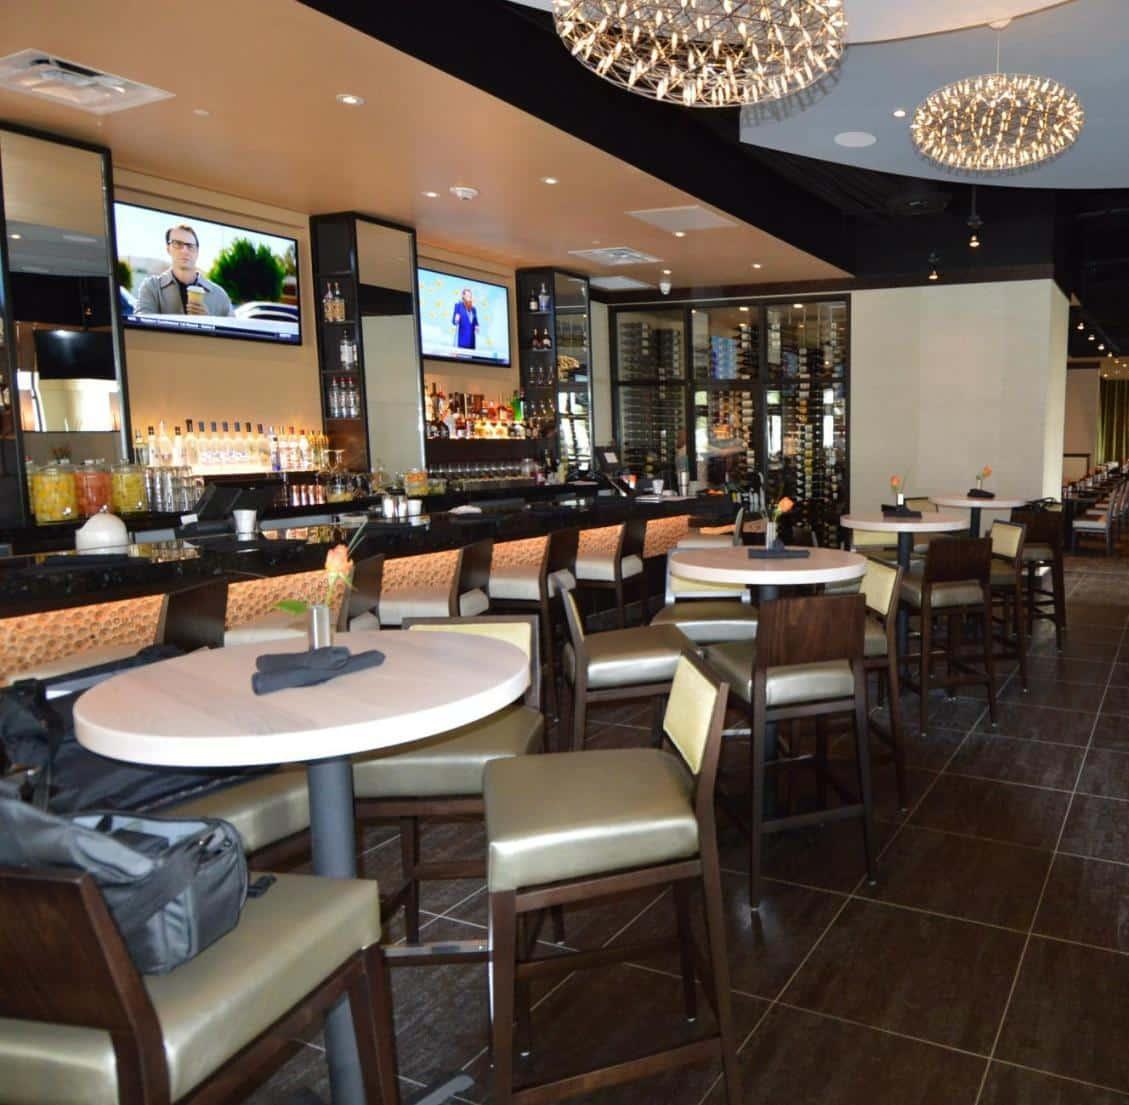 Commercial Wine Cellar Jasper's Restaurant Texas